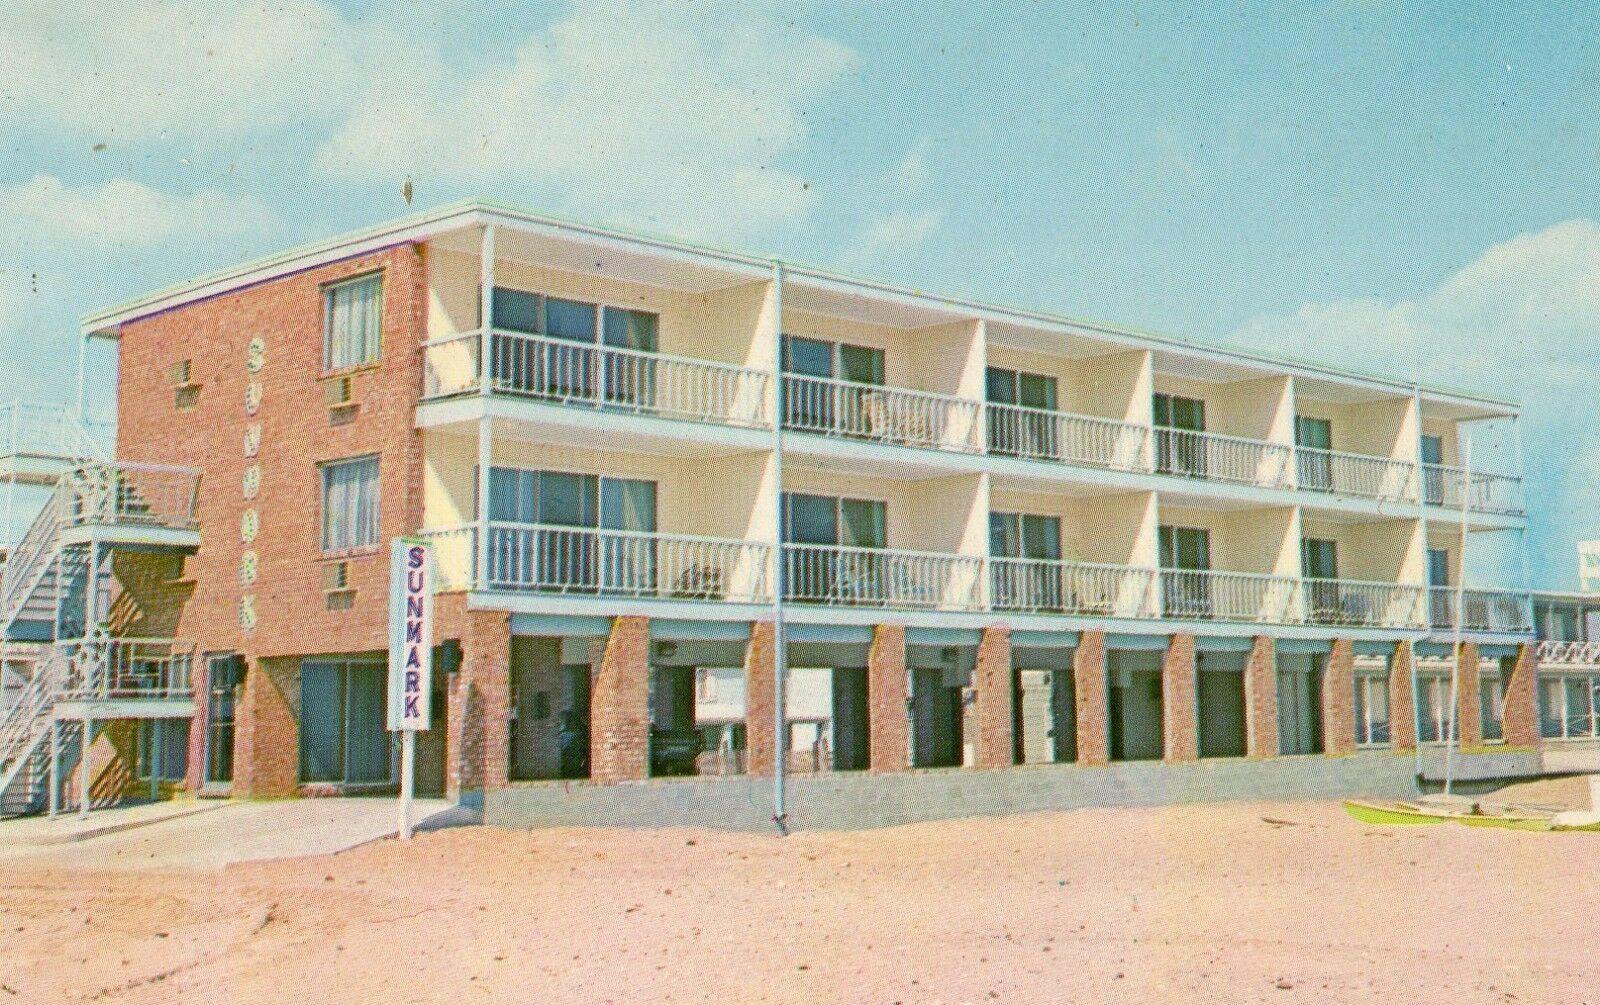 Sunmark Motel In Ocean City Md Old Ocean City Maryland Ocean City Ocean City Md